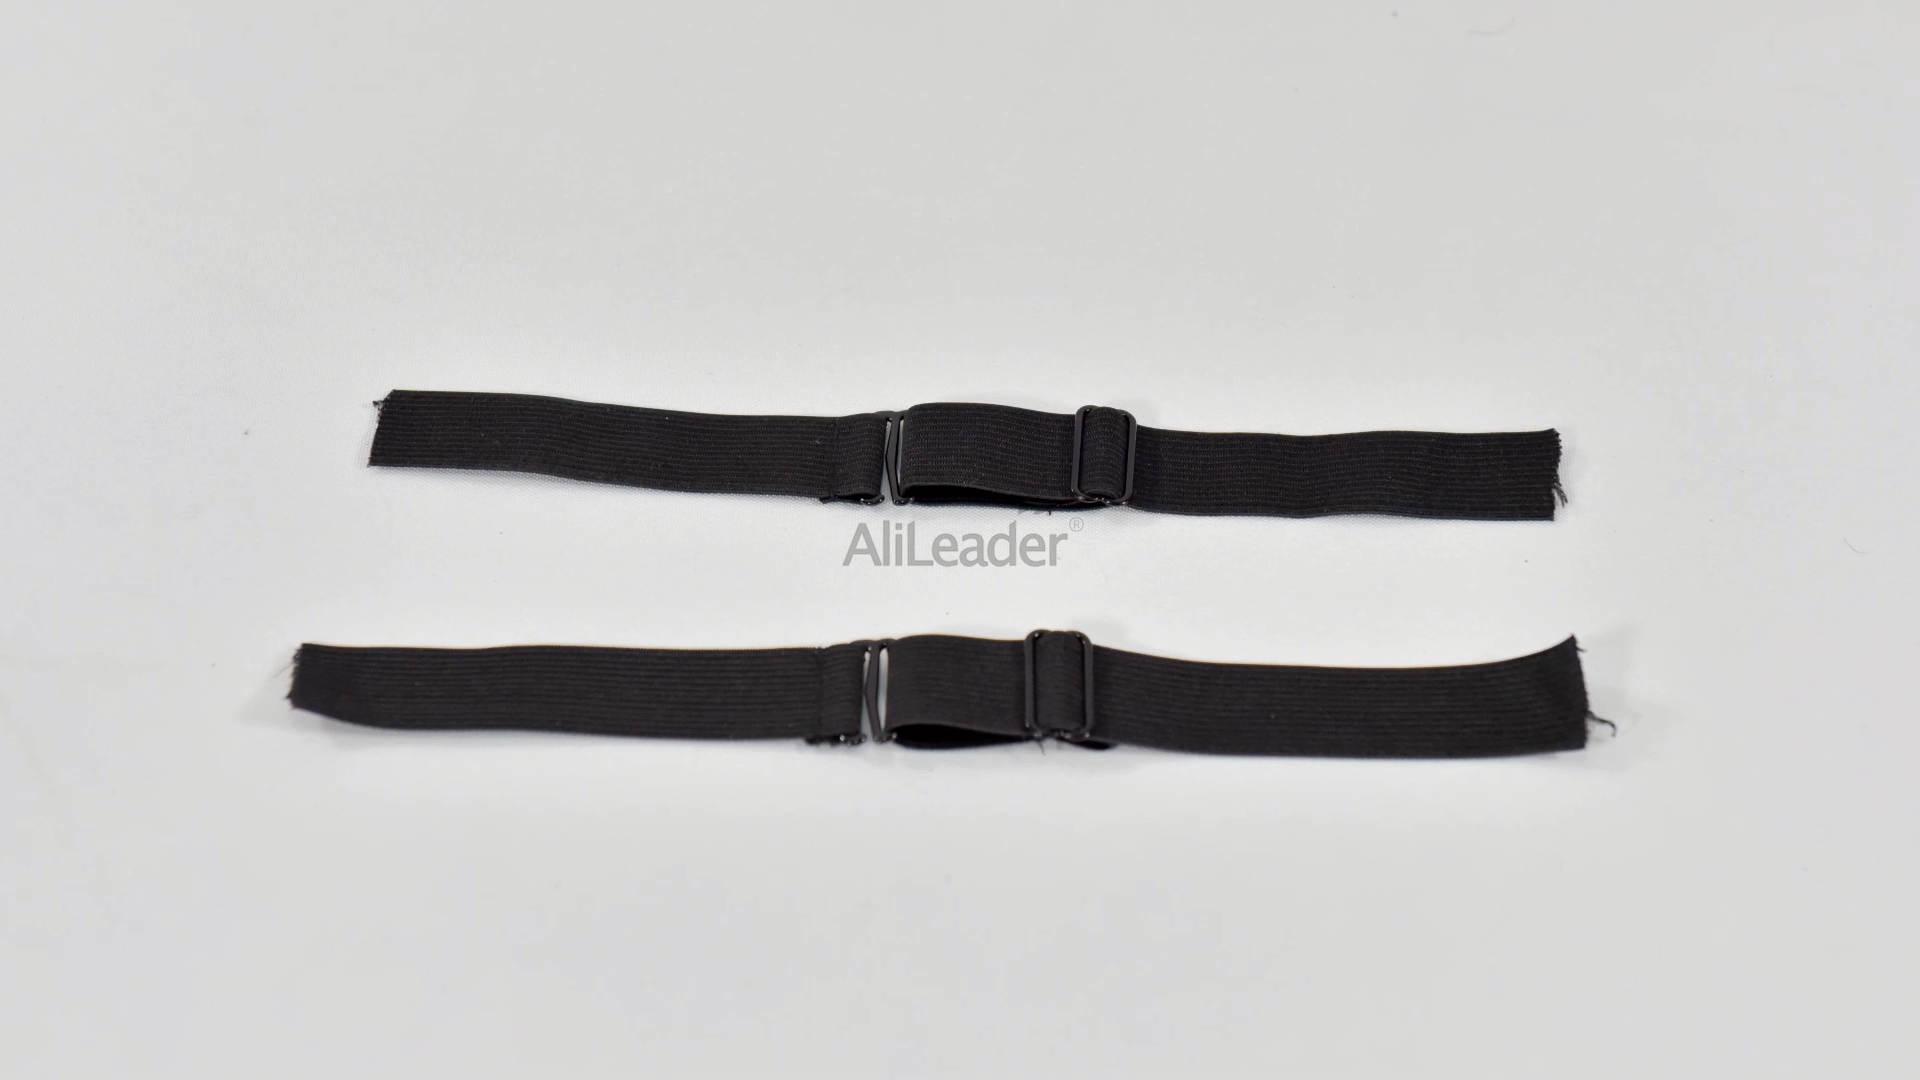 Alileader 2.5cm Custom Wig Elastic Bands Nylon Webbing Adjustable Elastic Wig Band For Making Wigs